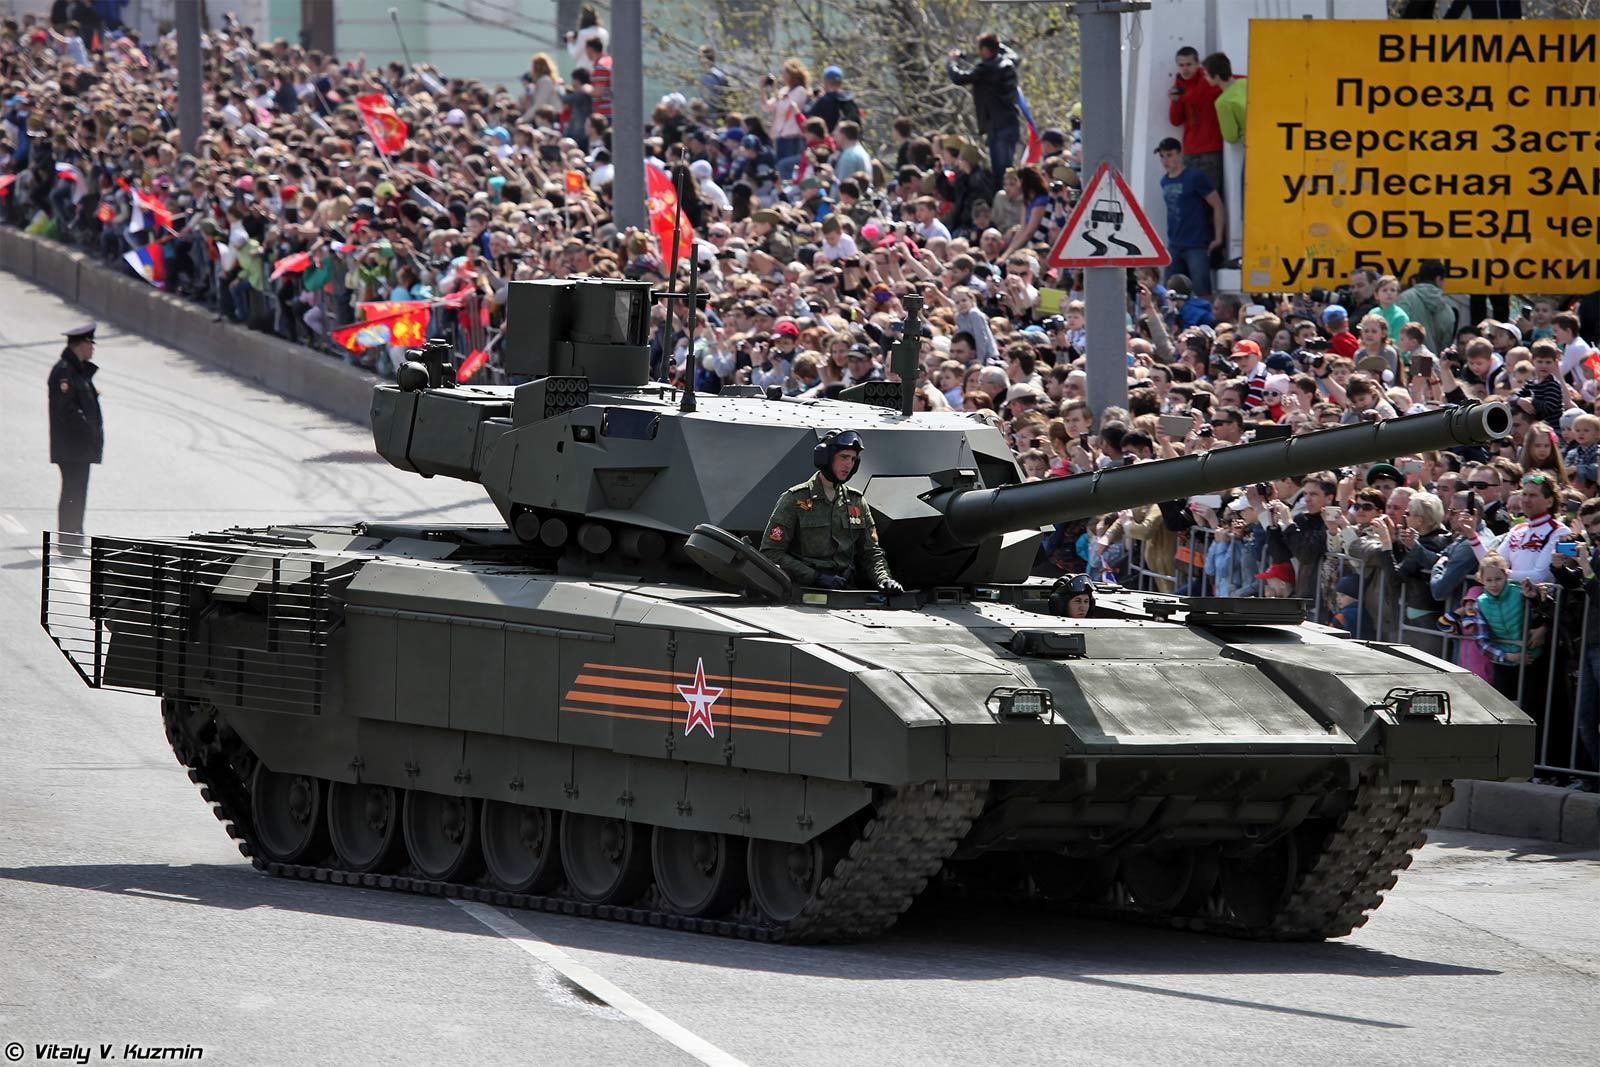 http://militaryrussia.ru/i/284/519/DUMDZ.jpg